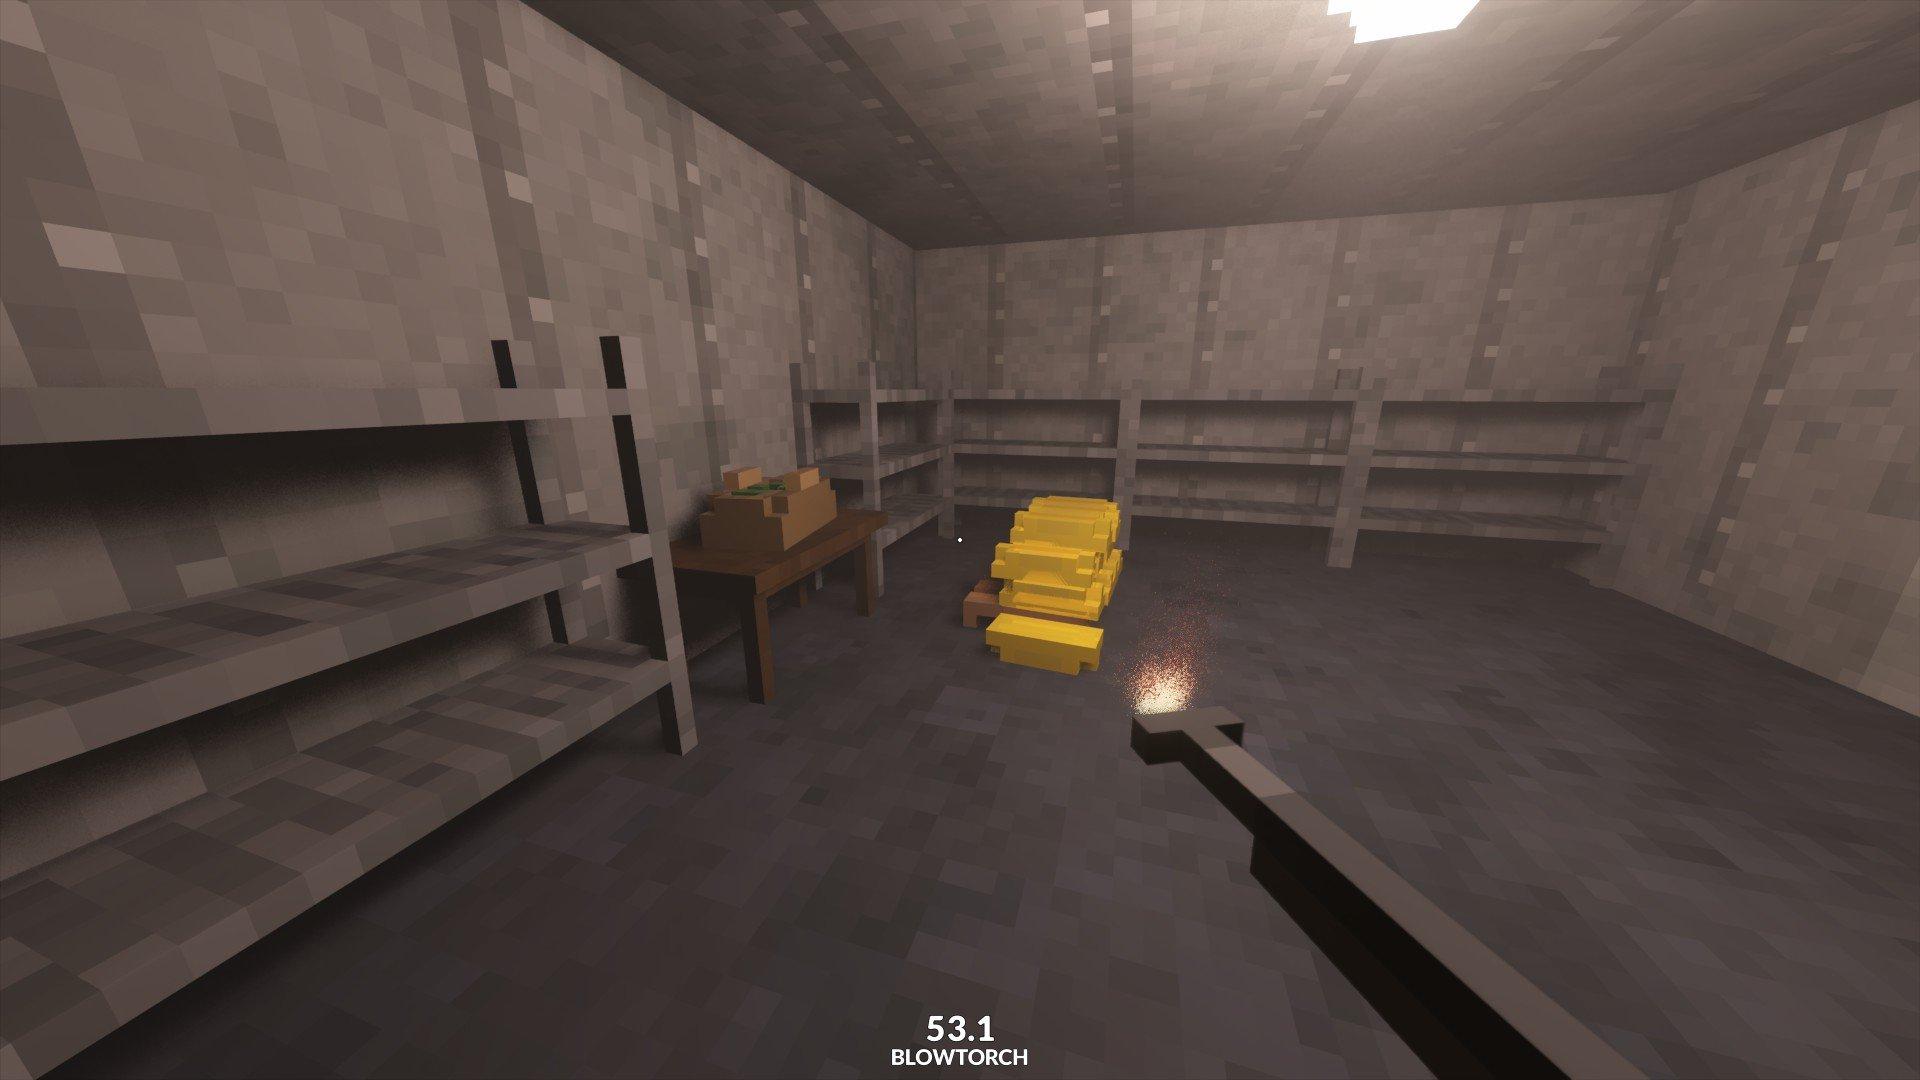 Teardown - How to Get Inside Vault